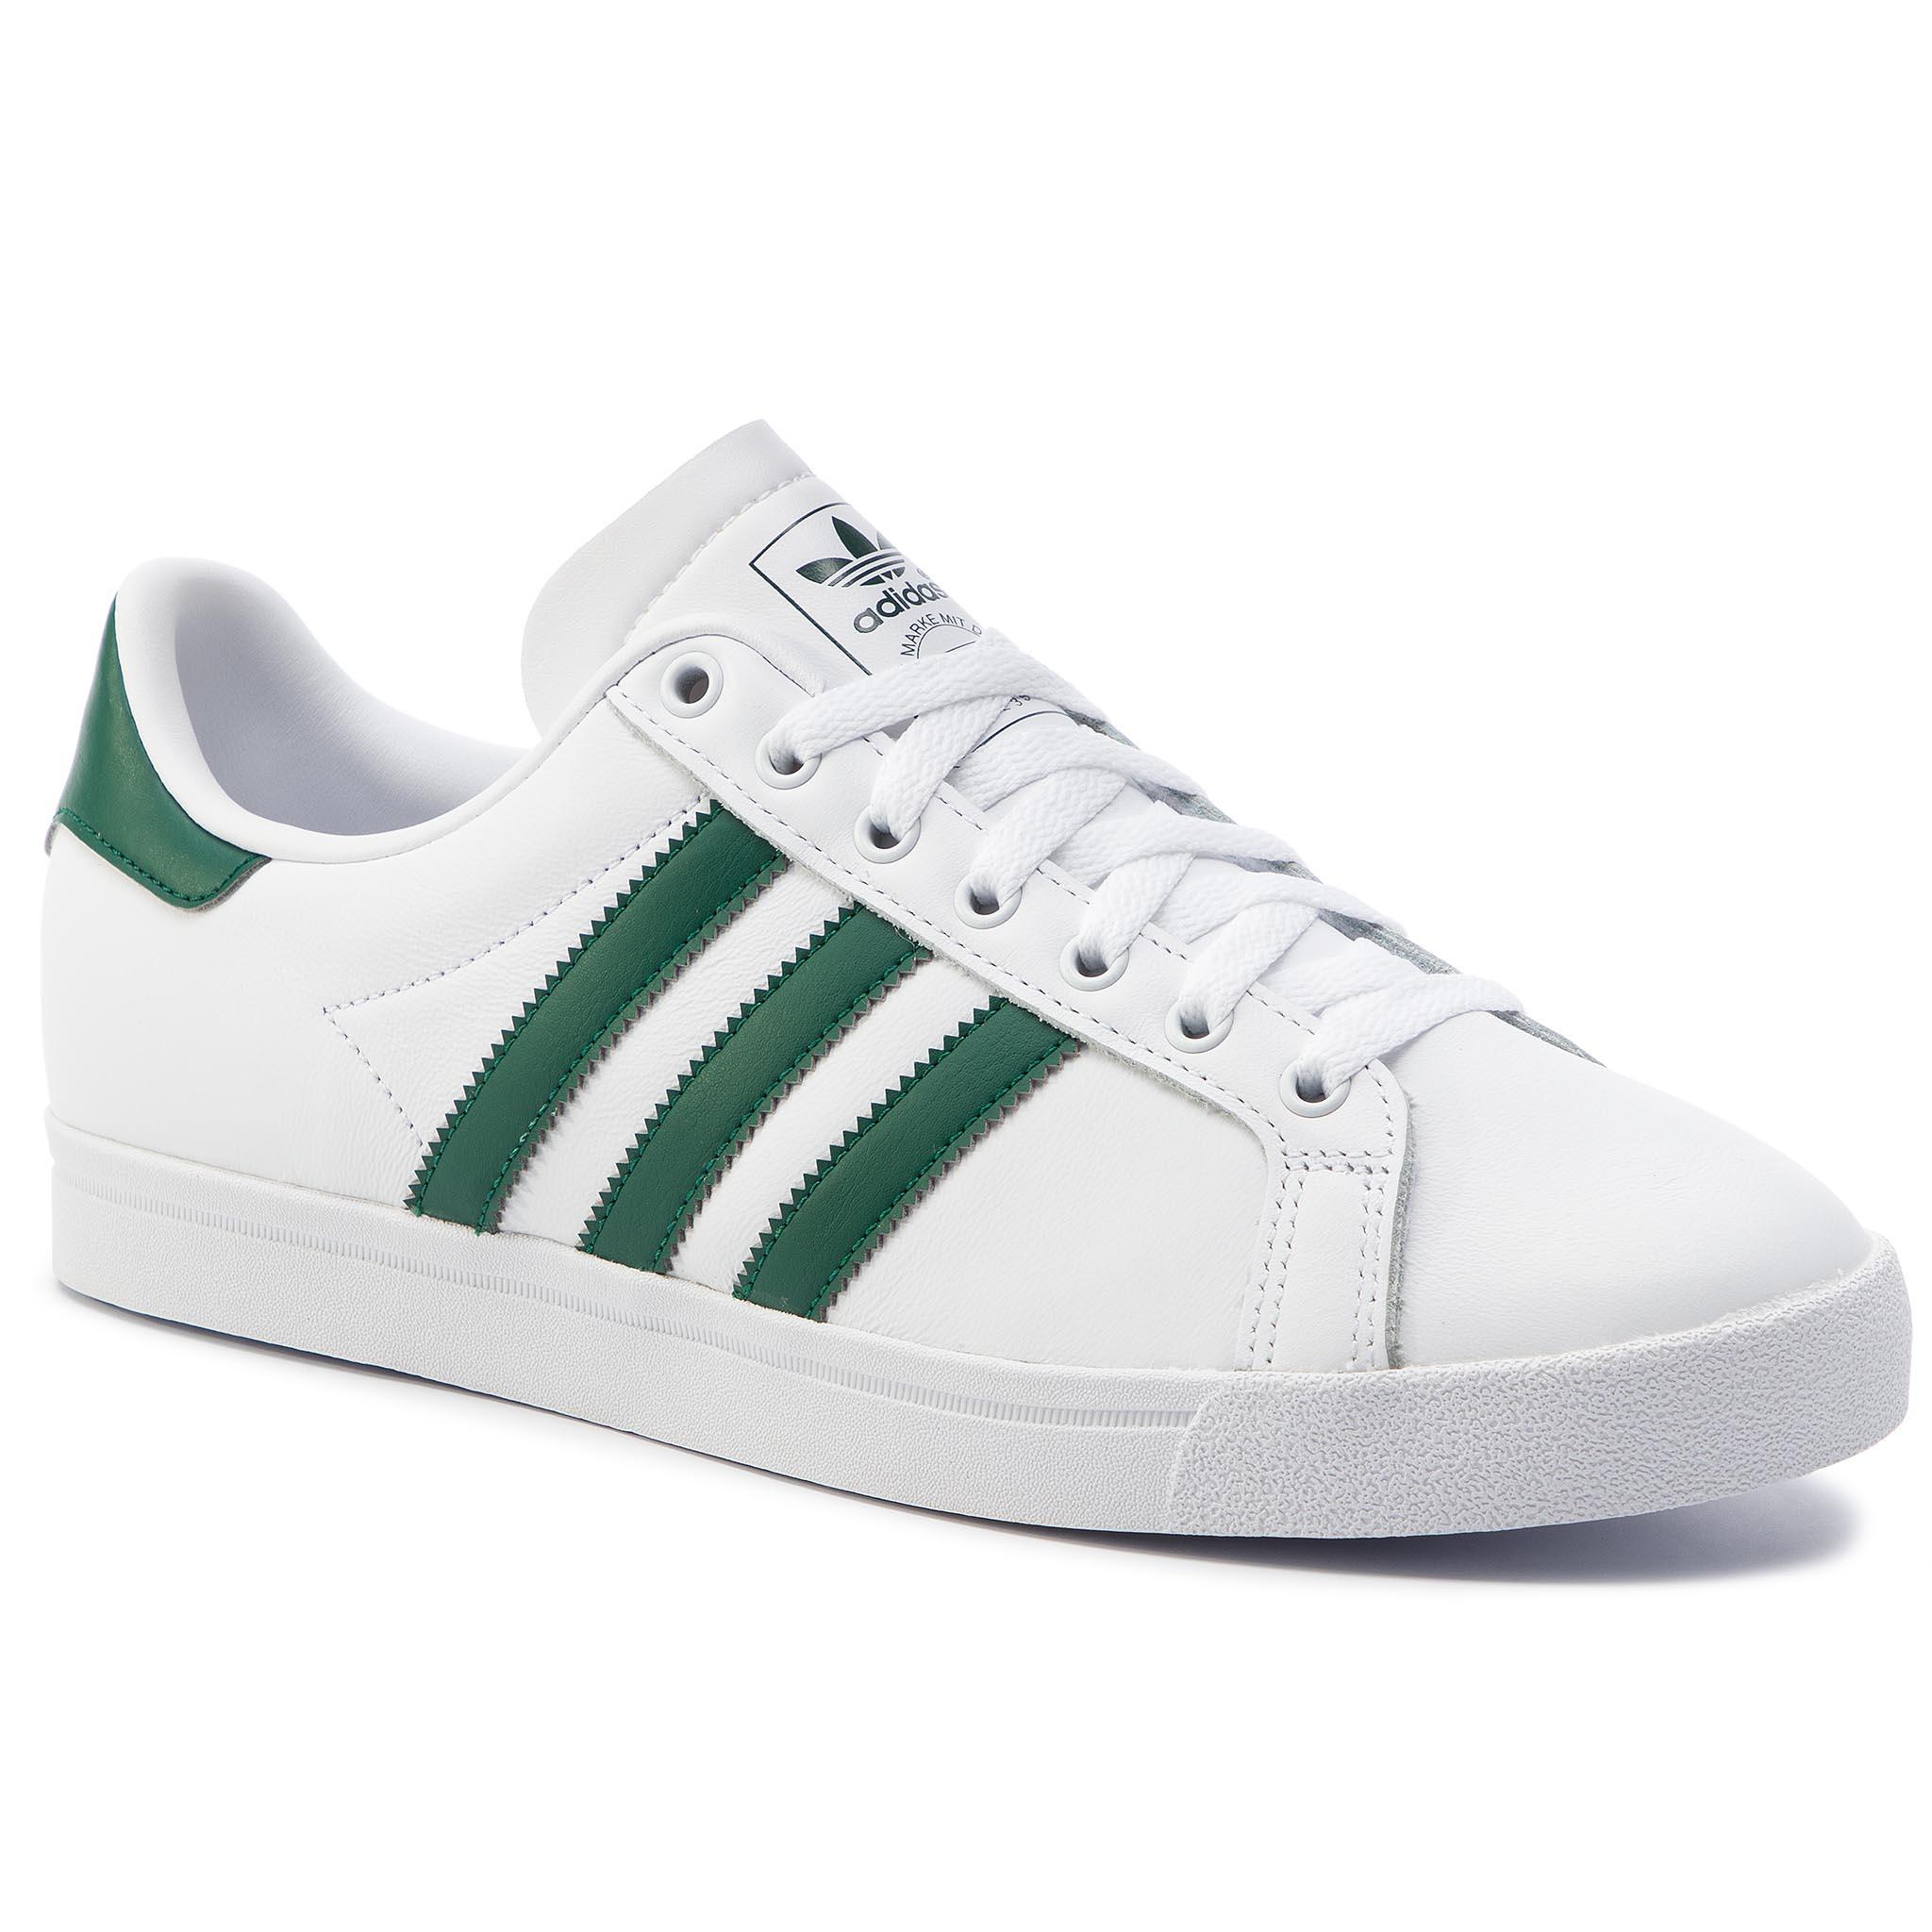 a7761b30a658 Shoes adidas - Montreal 76 BD7634 Vapgrn/Cblack/Cwhite - Sneakers ...